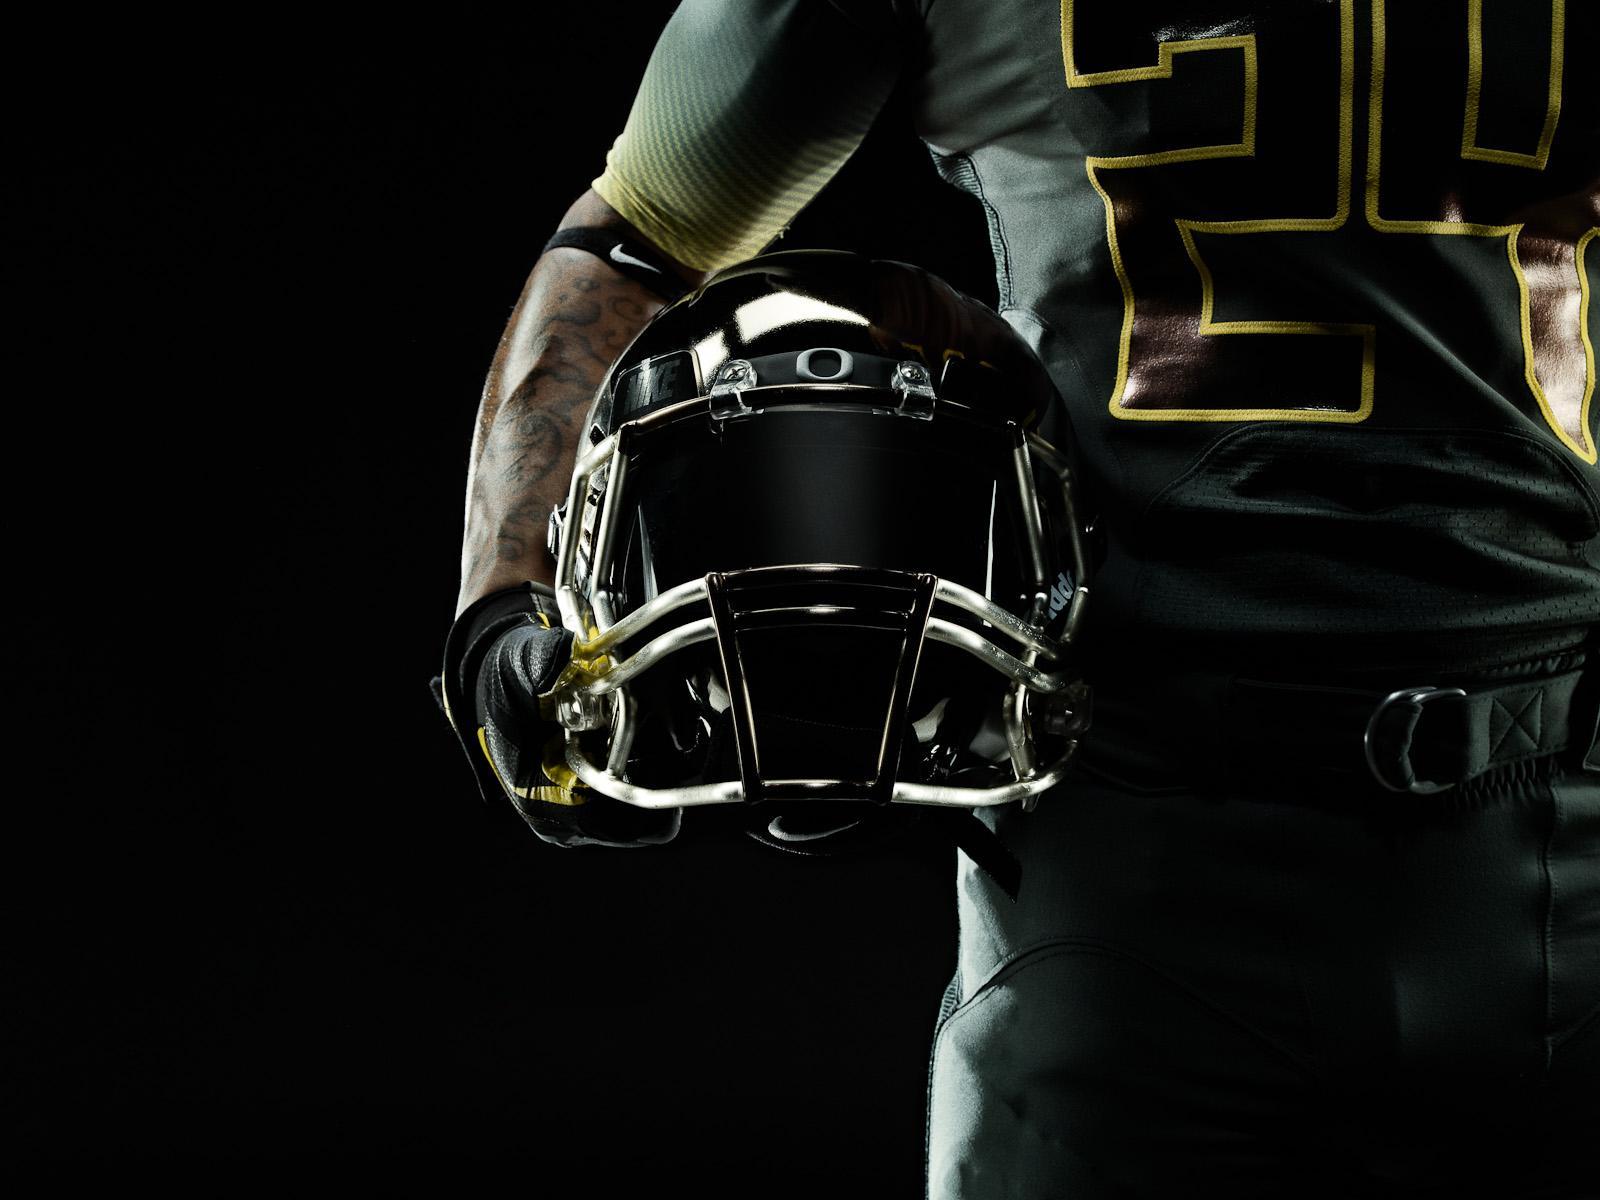 Les Oregon Ducks Uniformes Nike Pro Combat: Marcus Eriksson / Photographe